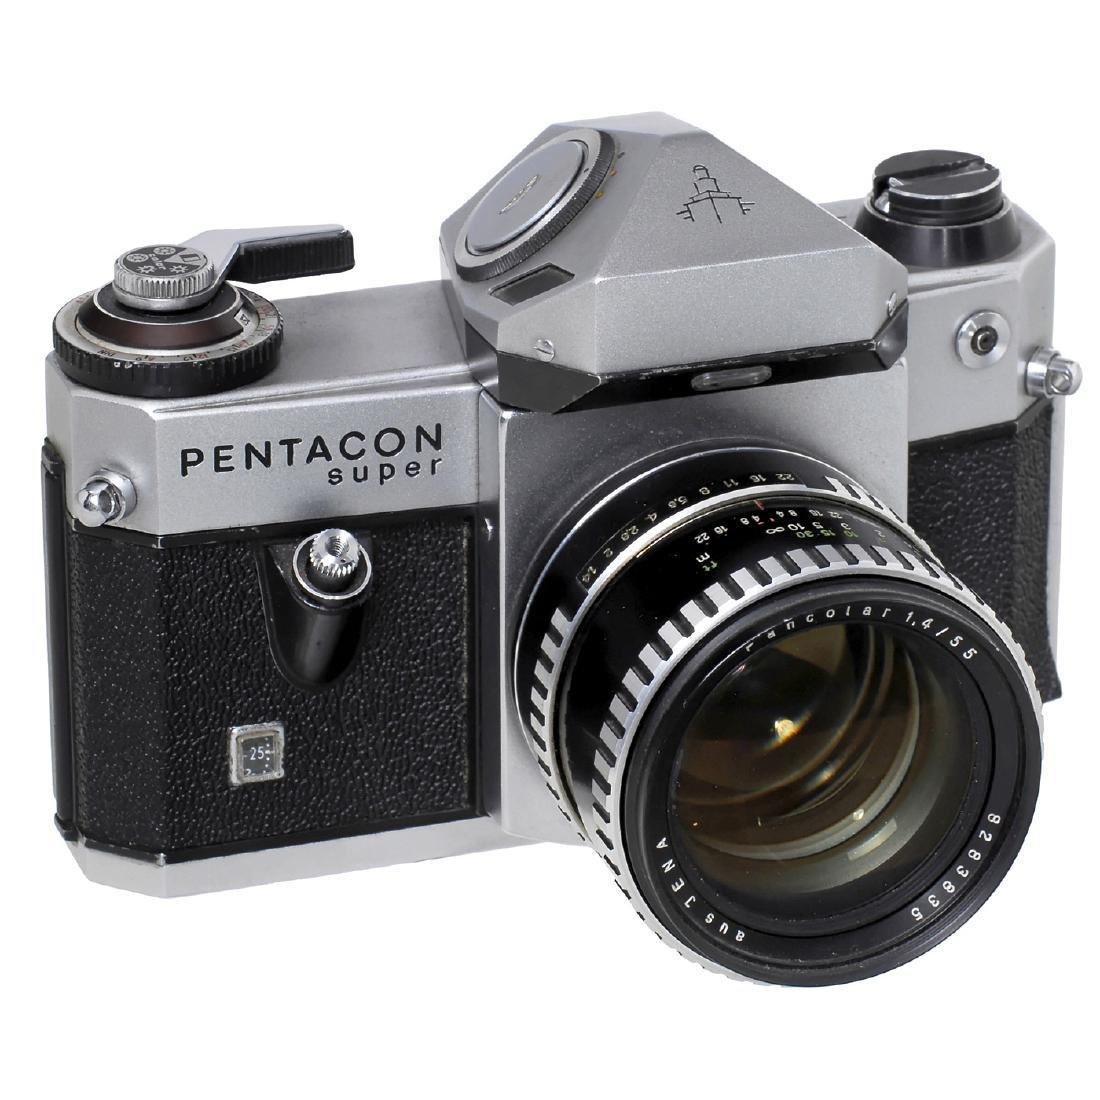 Pentacon Super, 1968